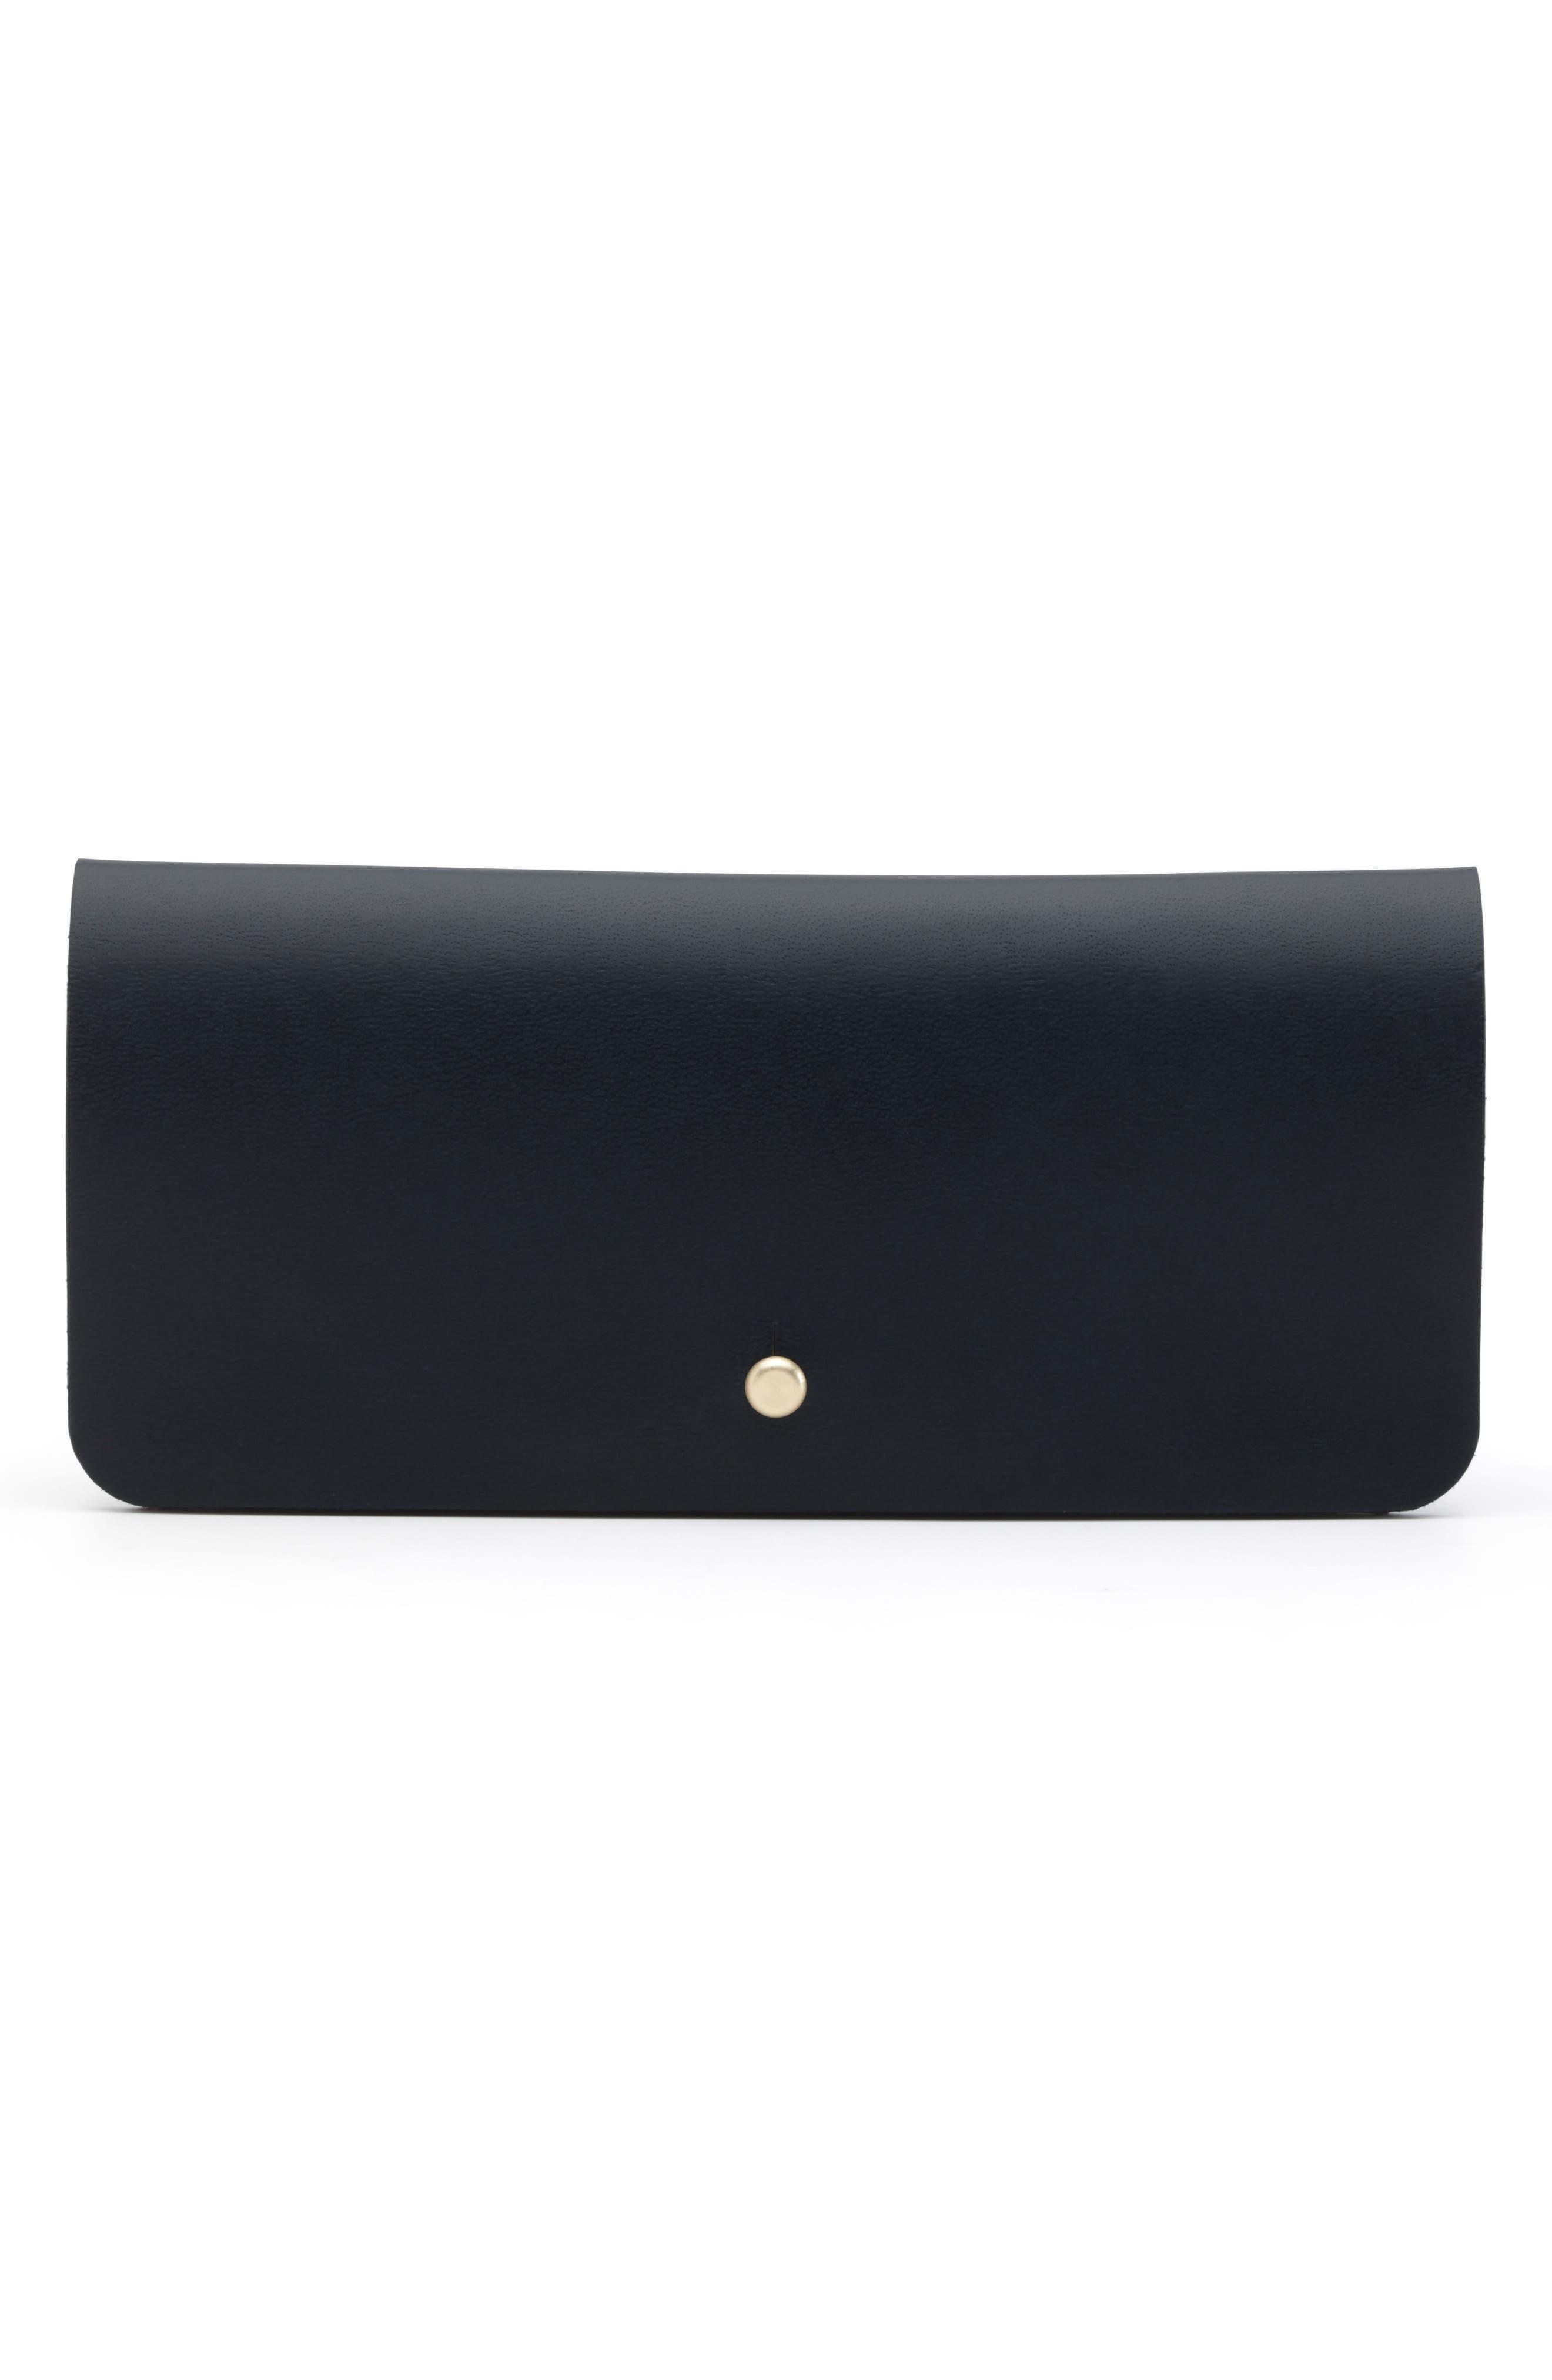 EZRA ARTHUR Leather Optical Case